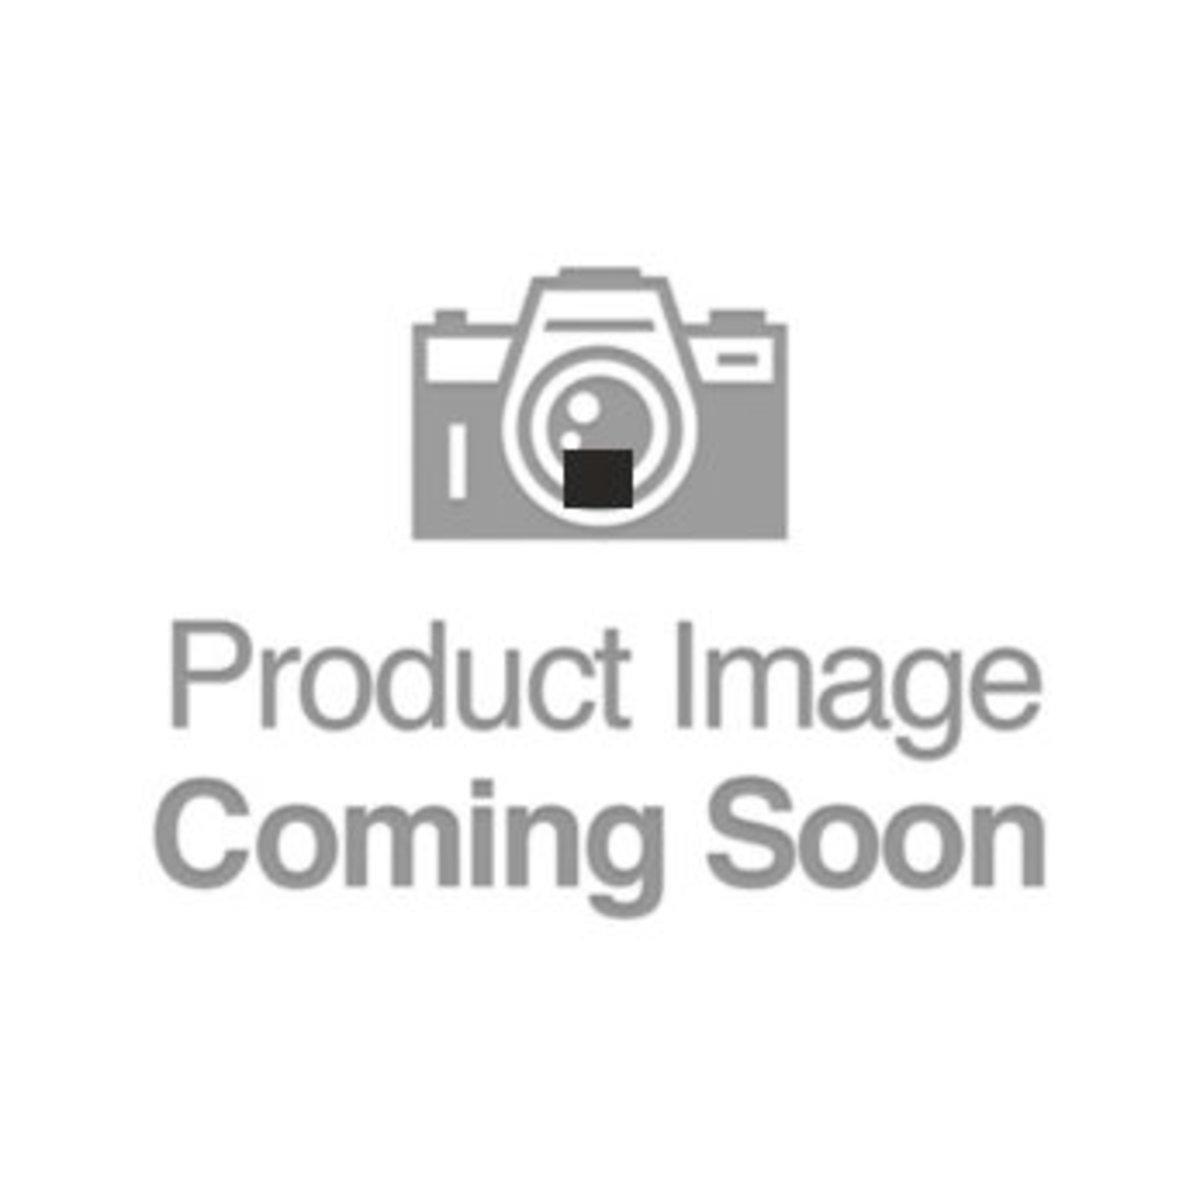 ISABELLA 純棉印花床品套裝 加大 (ML1542)